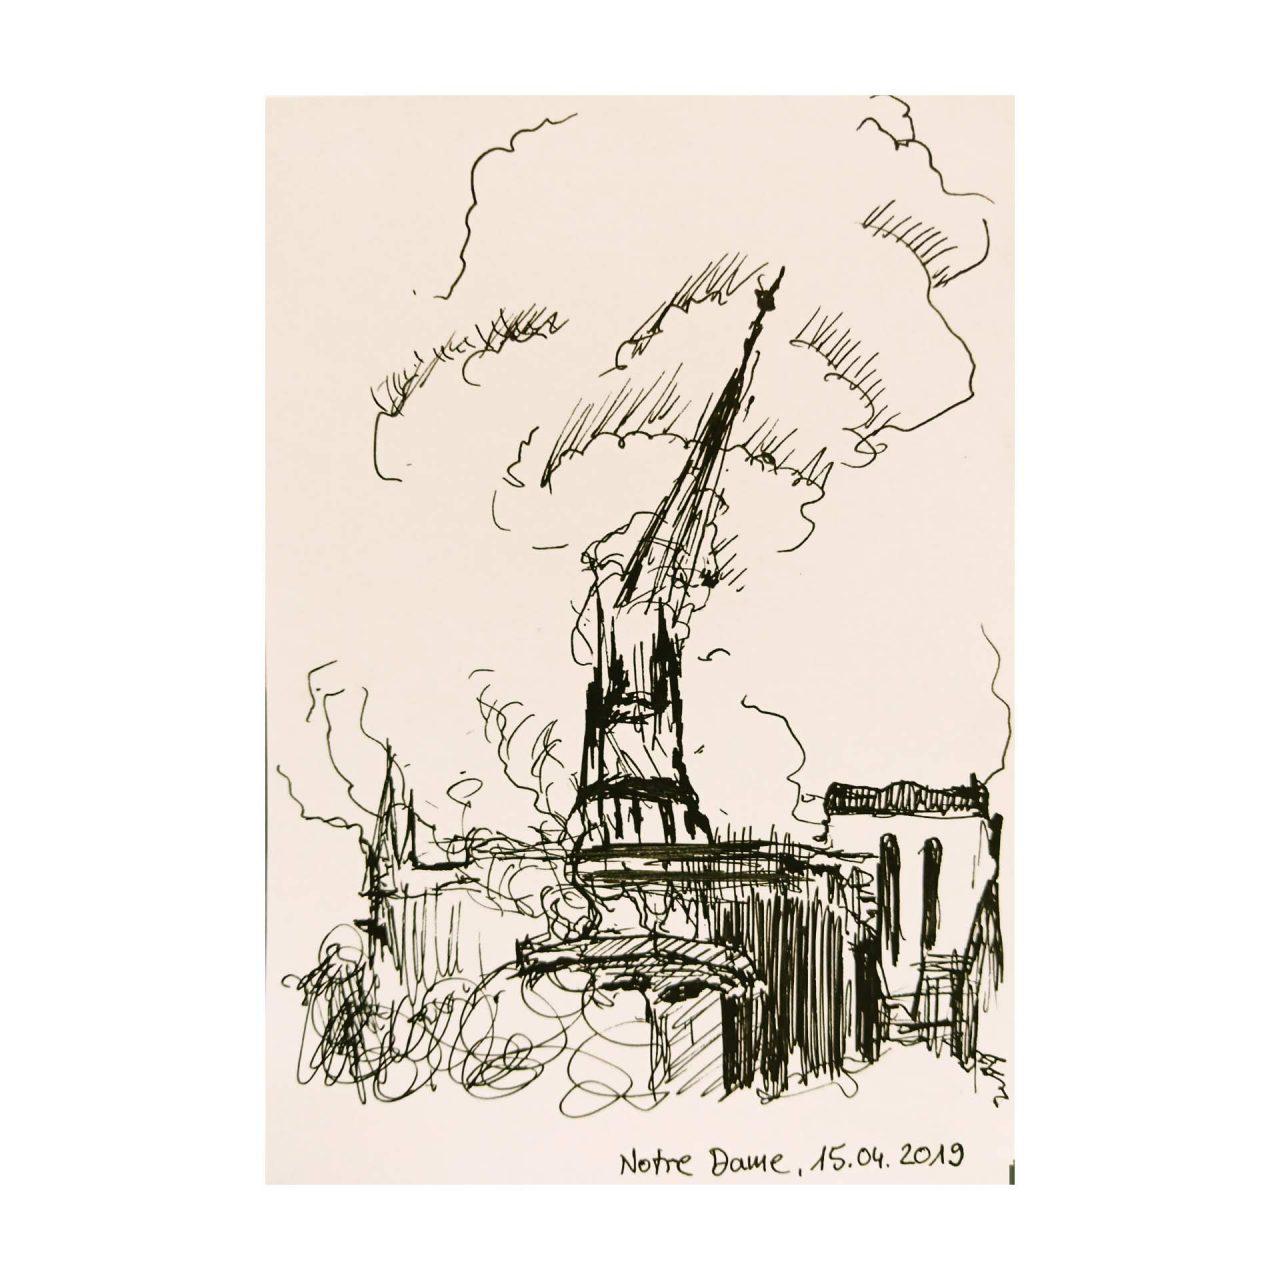 NOtre Dame 2019, pigment ink on paper, 14,8 x 10,5 cm